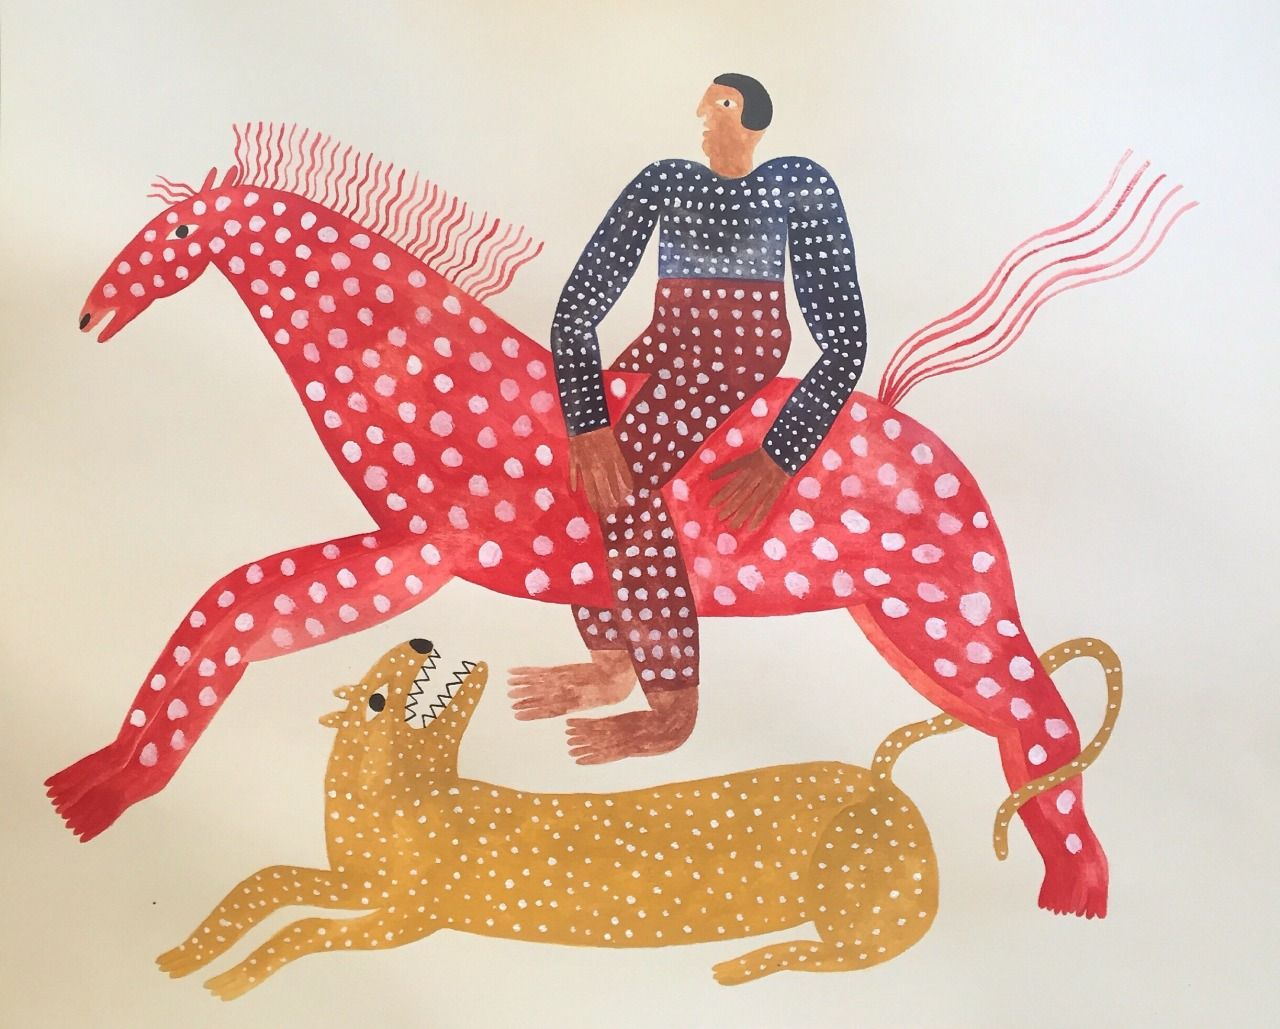 Audrey Helen Weber Horse Illustration Theatre Illustration Childrens Art